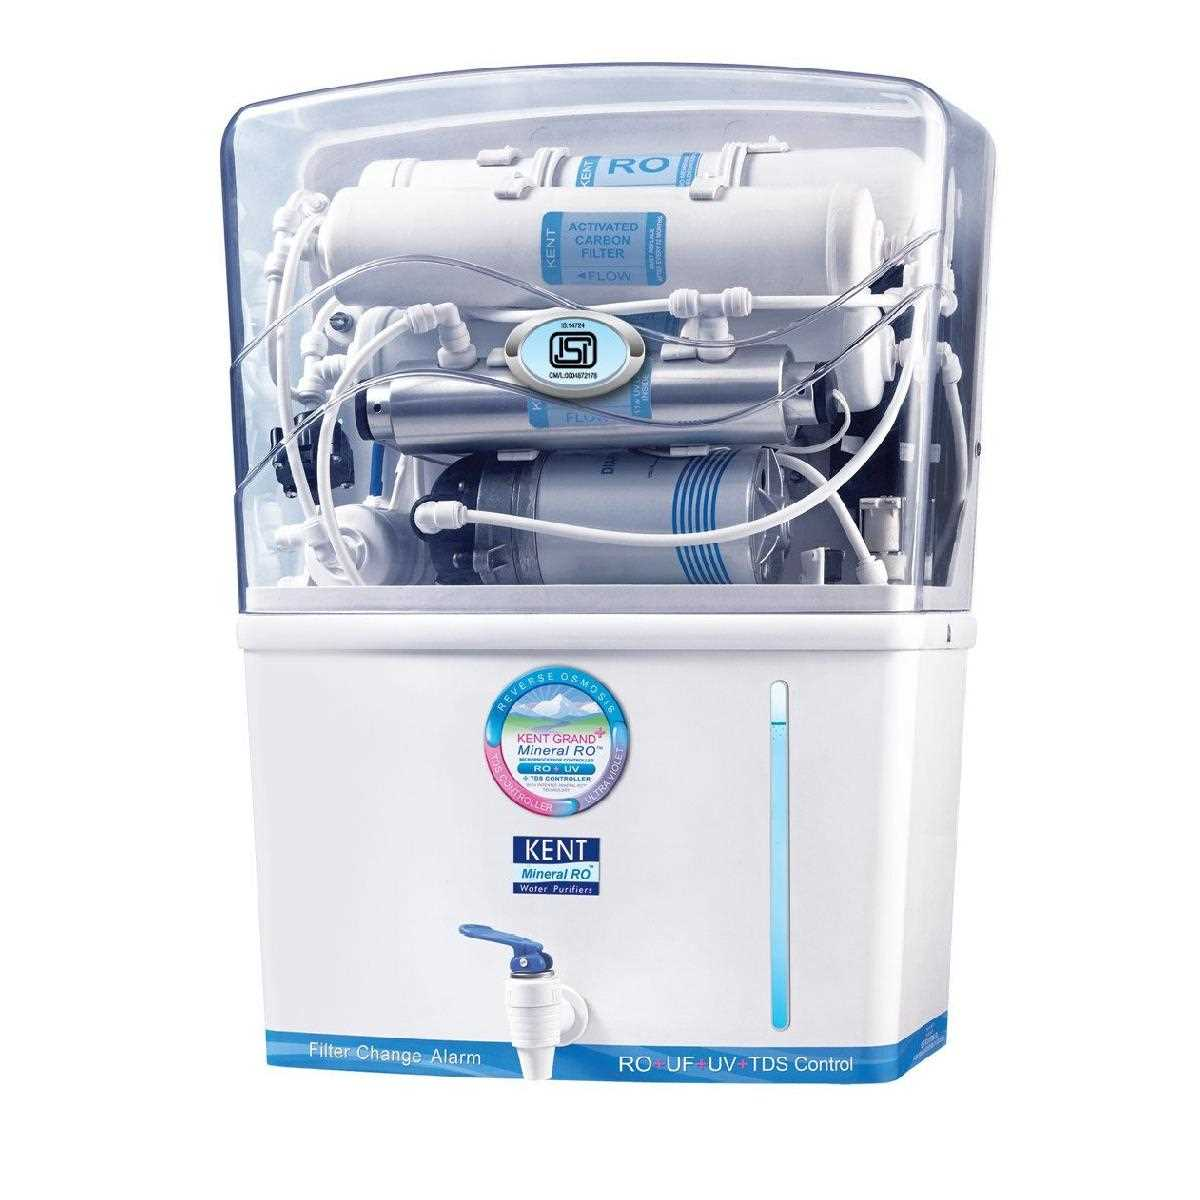 382ccbc036c Kent Grand Plus 8 Litre Water Purifier Price  3 Jun 2019